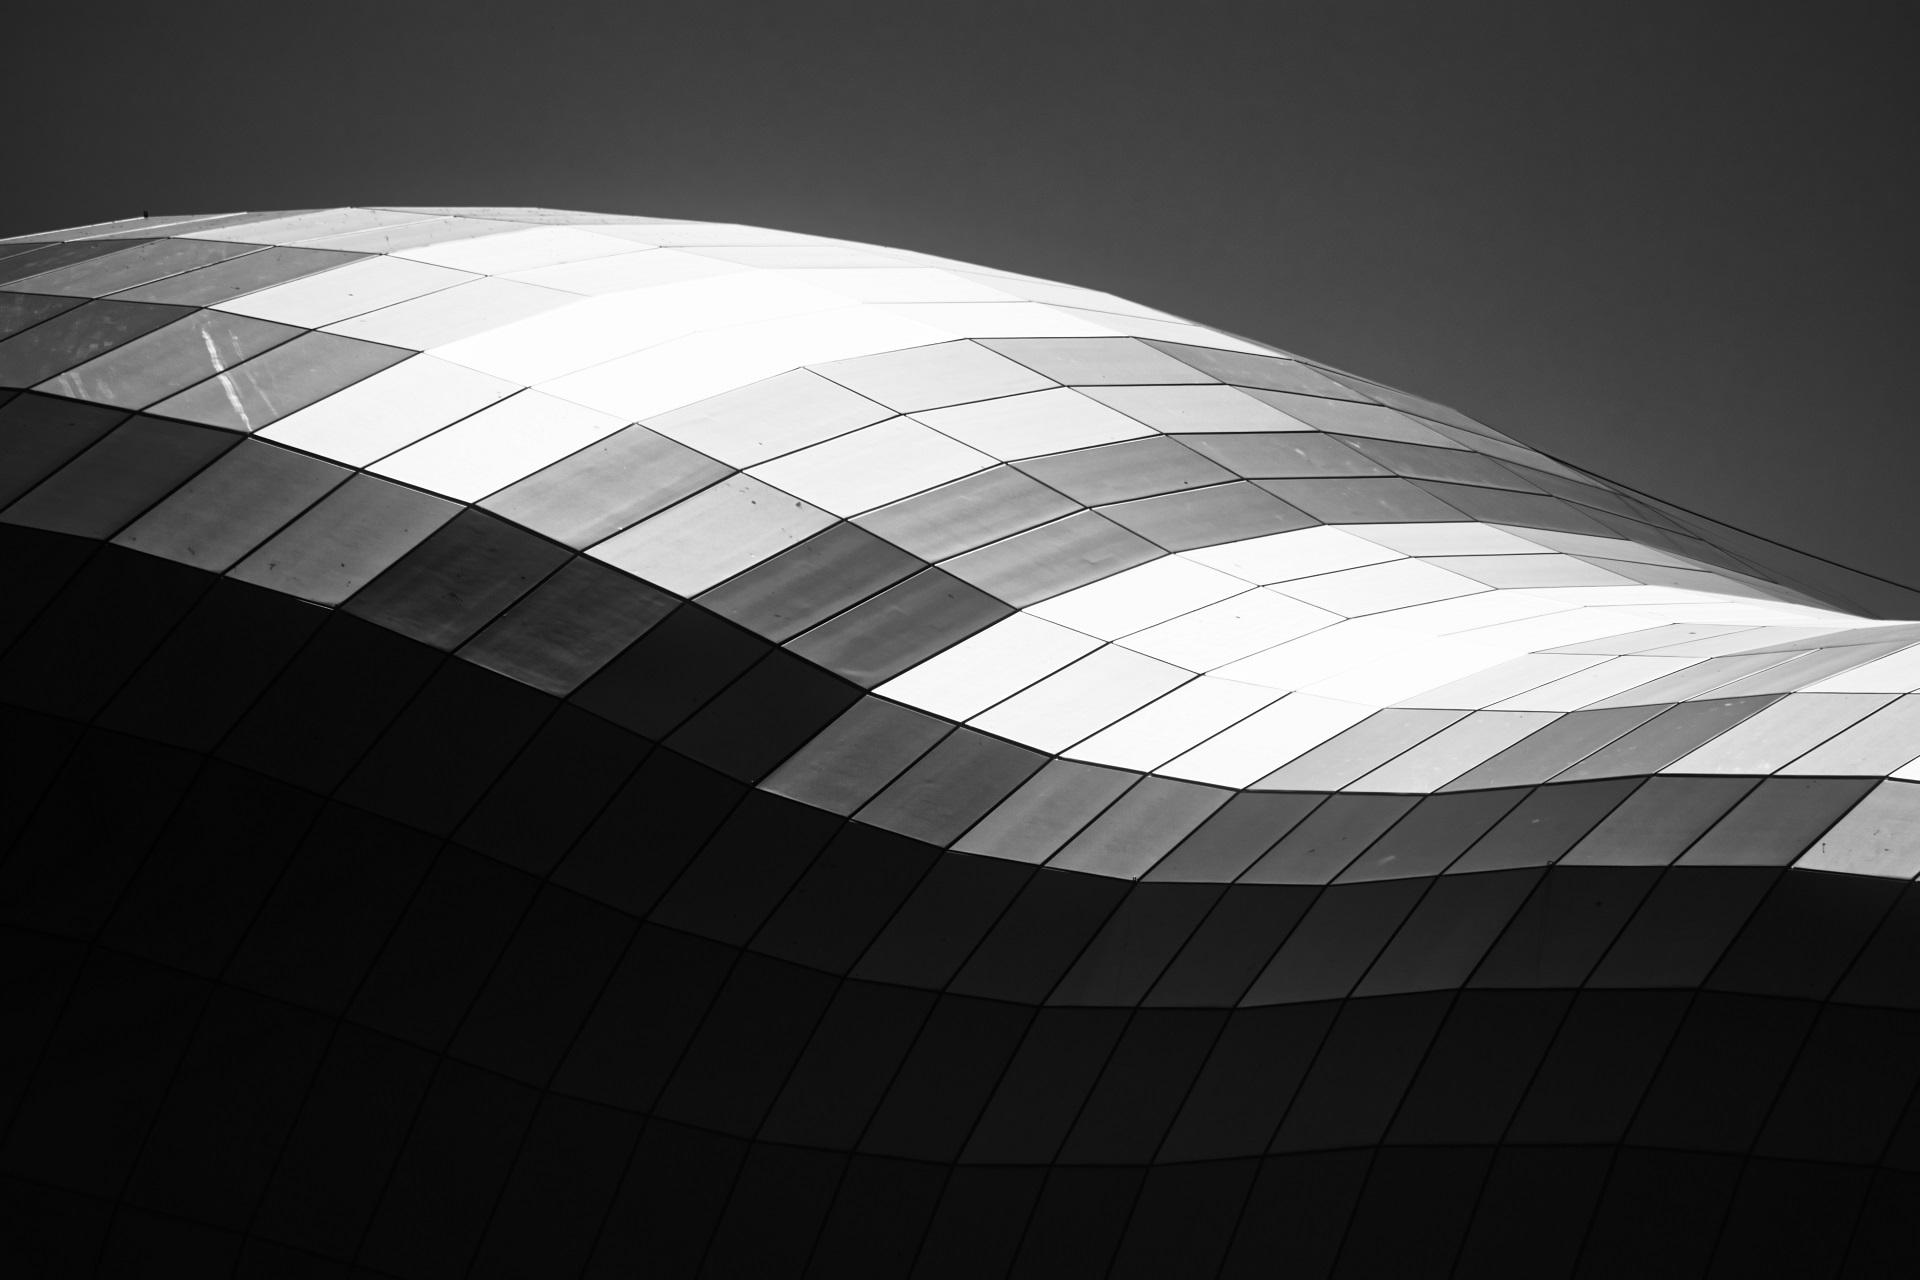 Monochrome photography example photo